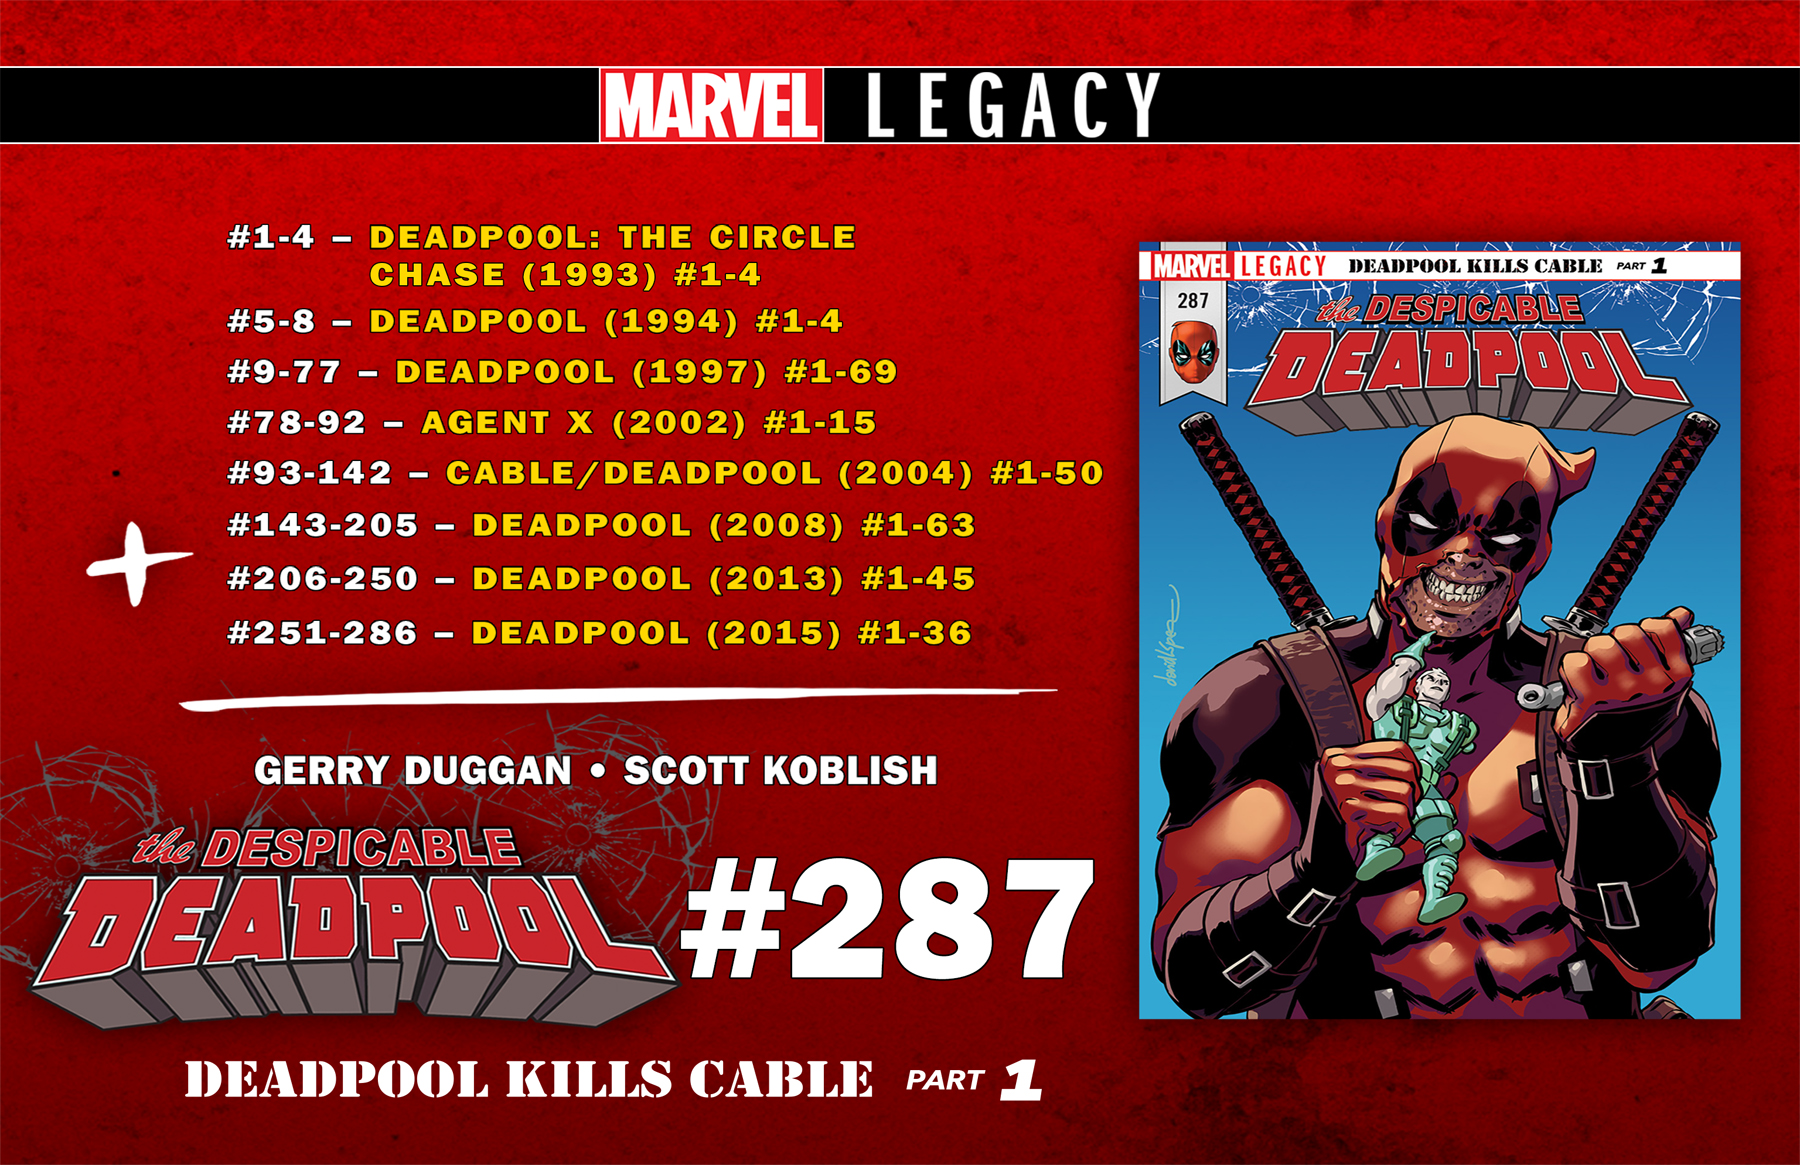 Deadpool #287